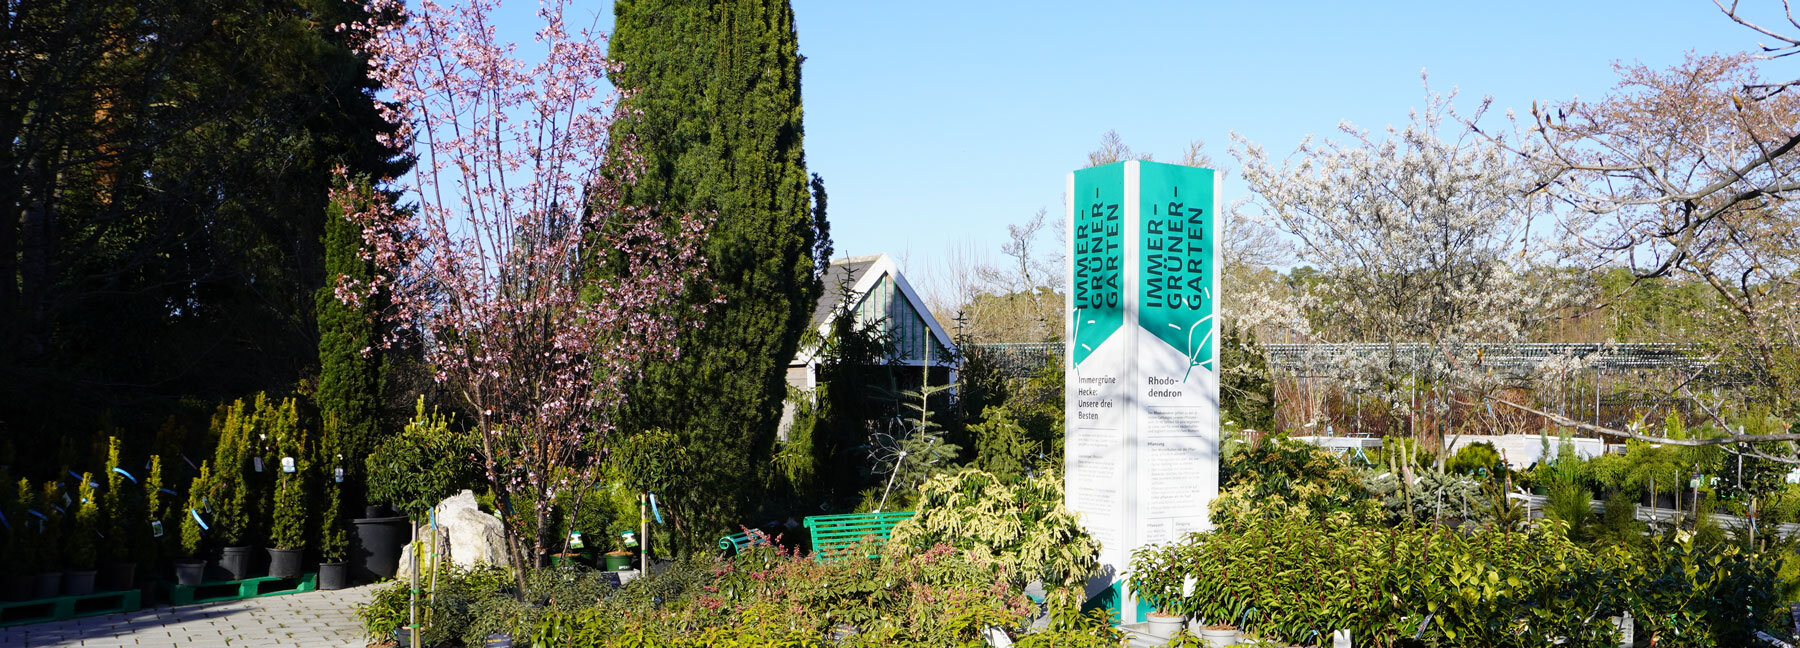 Immergrüner Garten Schopf